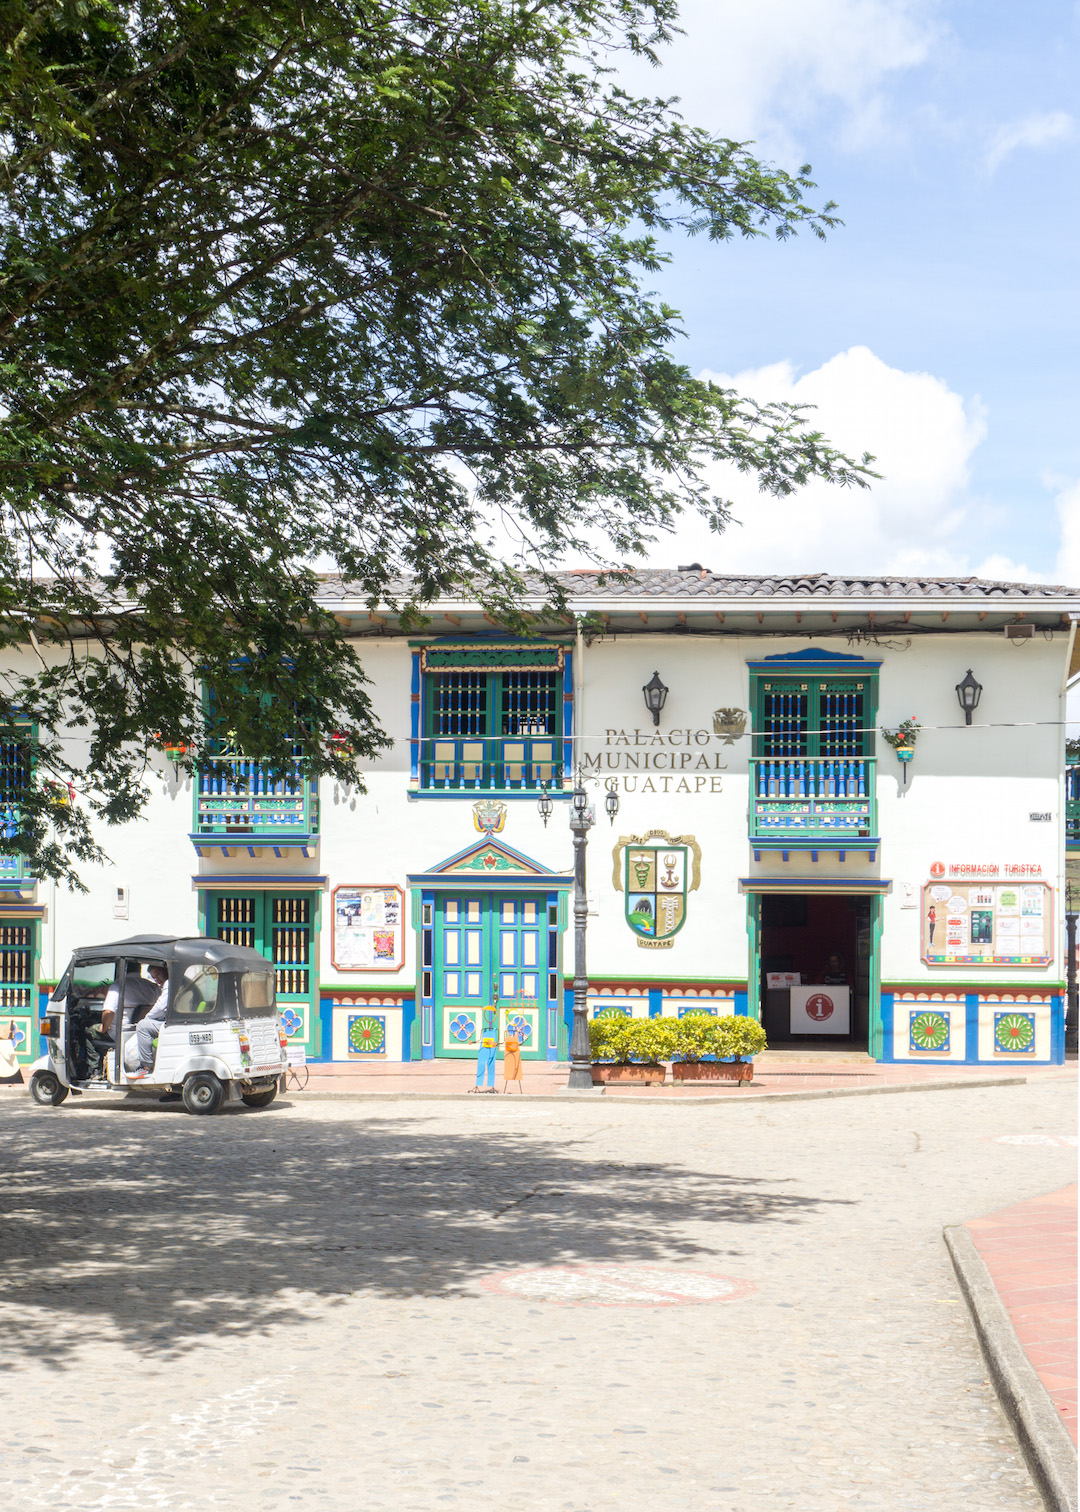 Her_Travel_Edit_Guatape_Palacio_Municipal